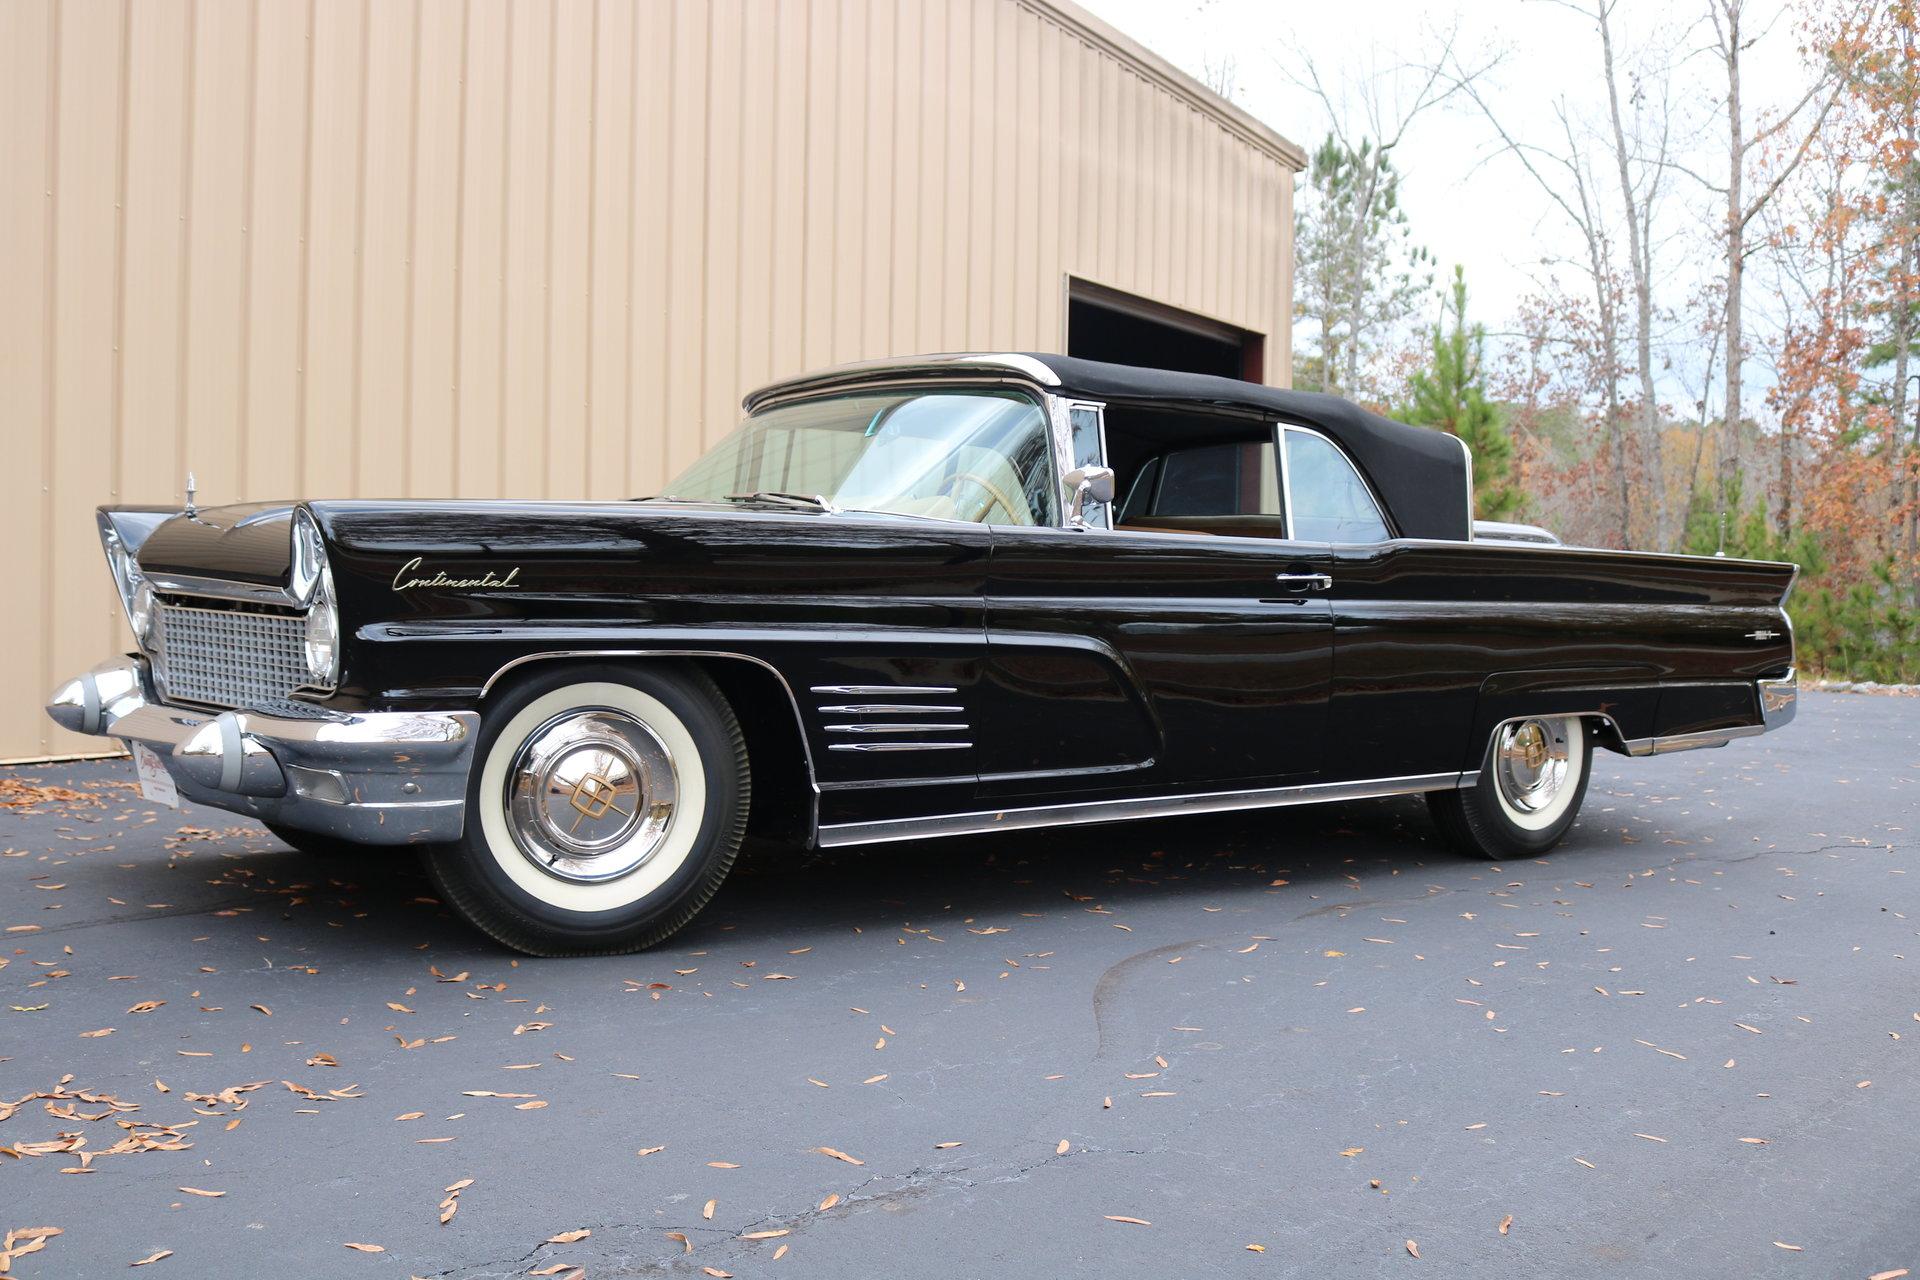 1960 lincoln continental gaa classic cars. Black Bedroom Furniture Sets. Home Design Ideas